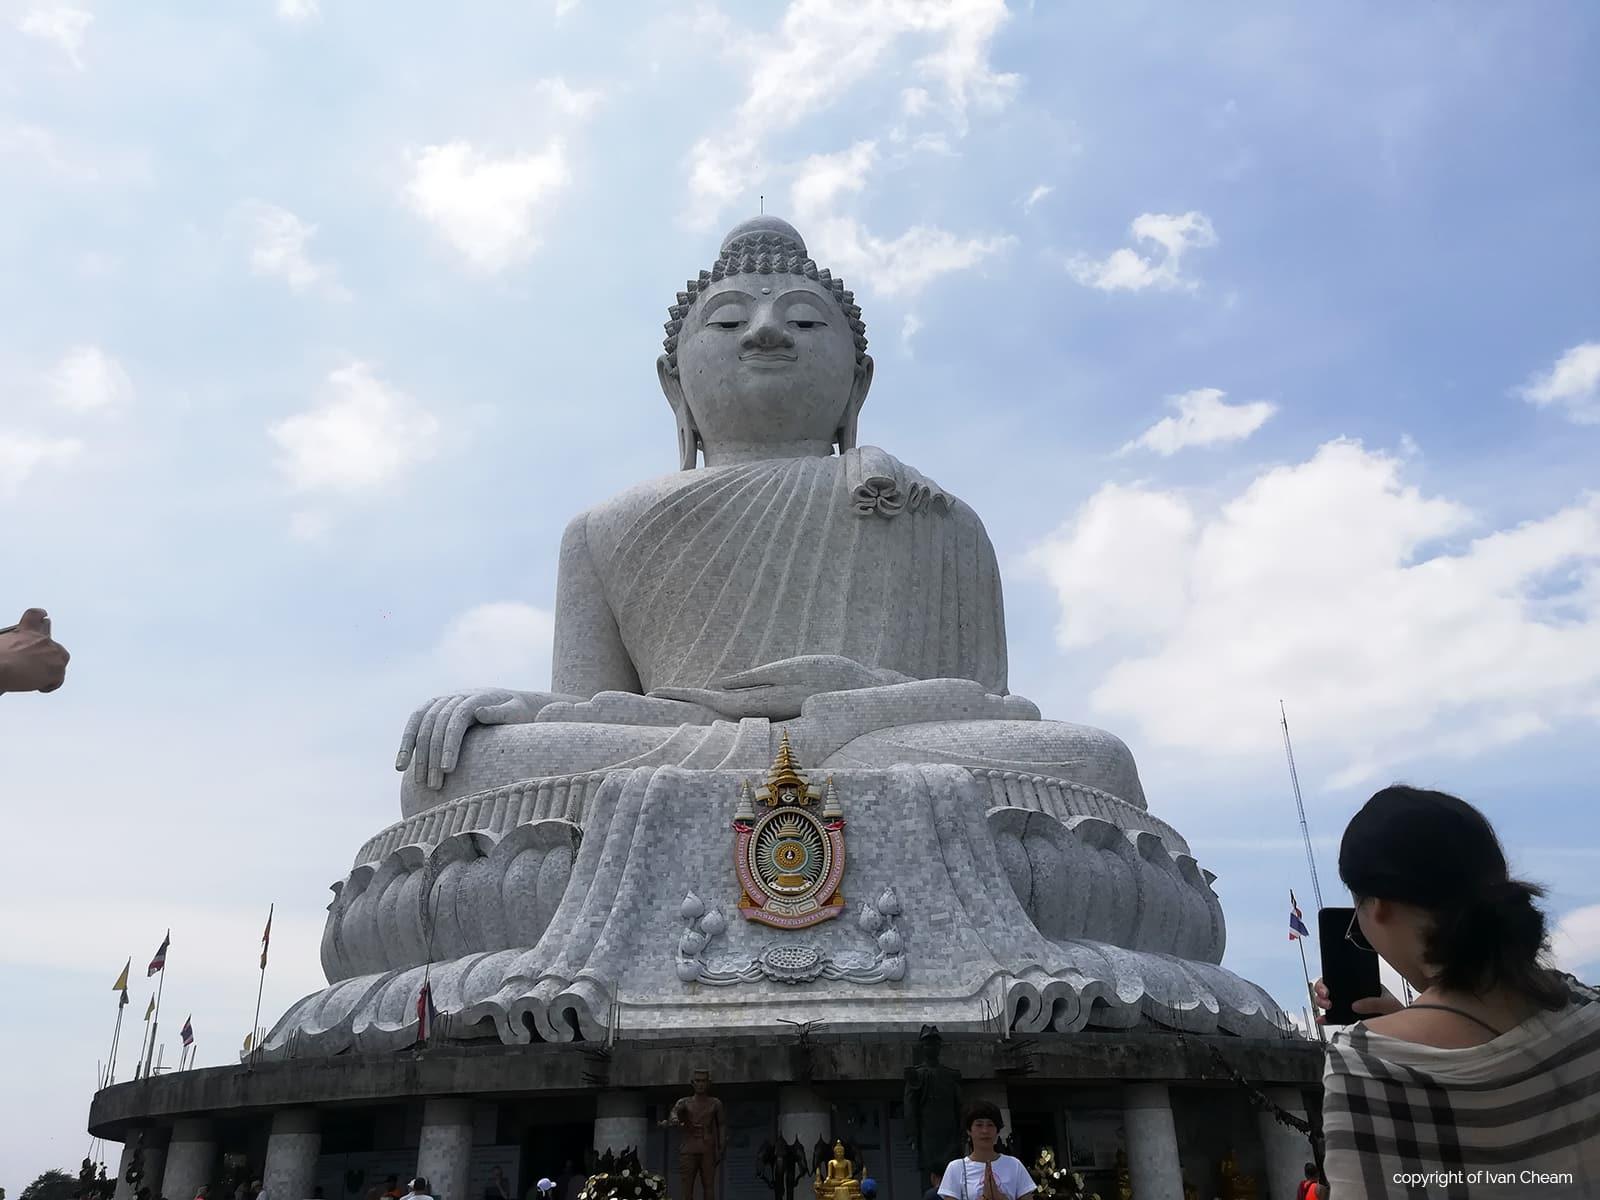 Big Buddha Phuket - Temple and Sightseeing